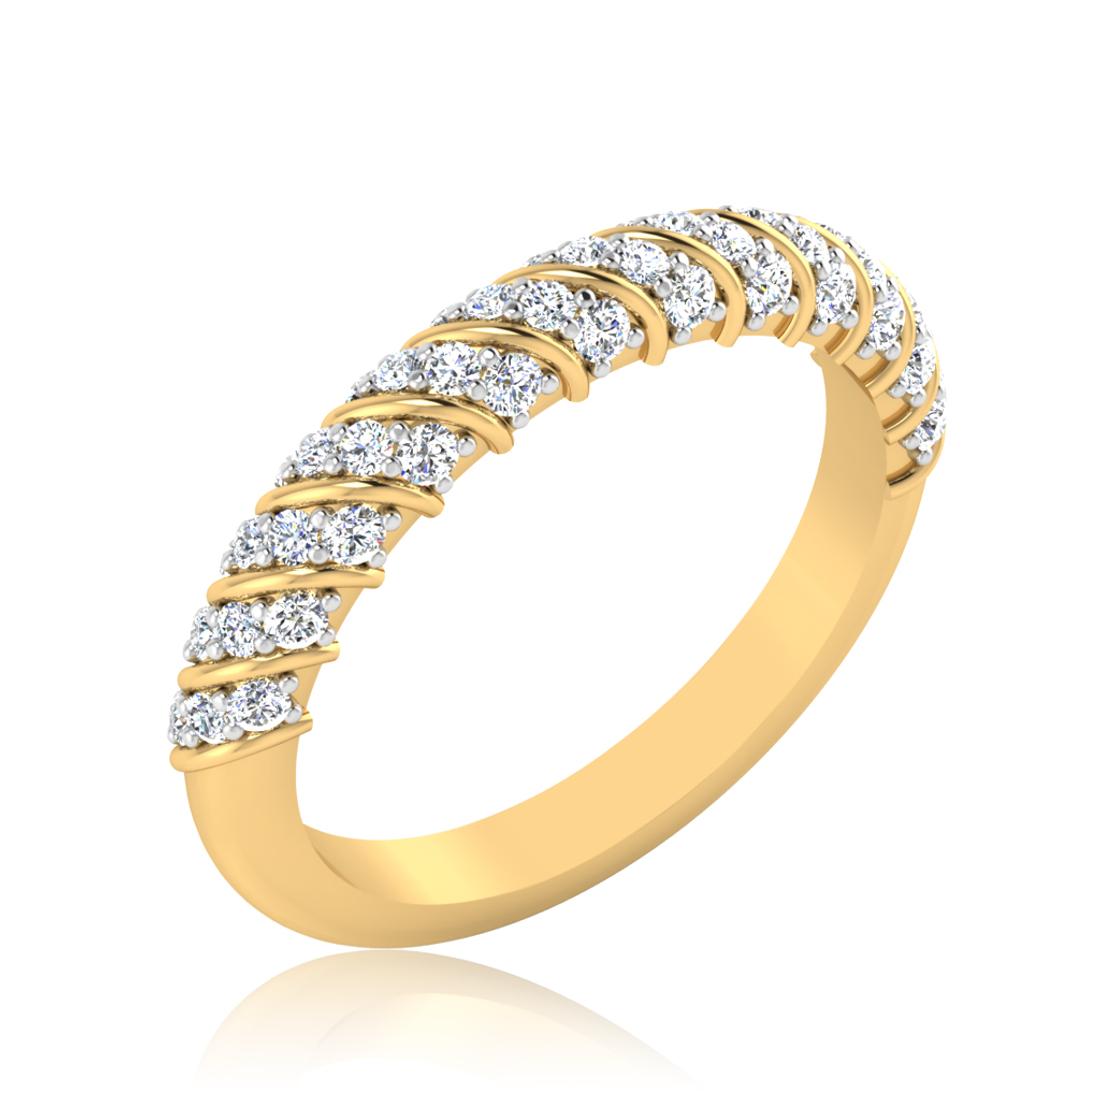 Iski Uski Mystic Ring